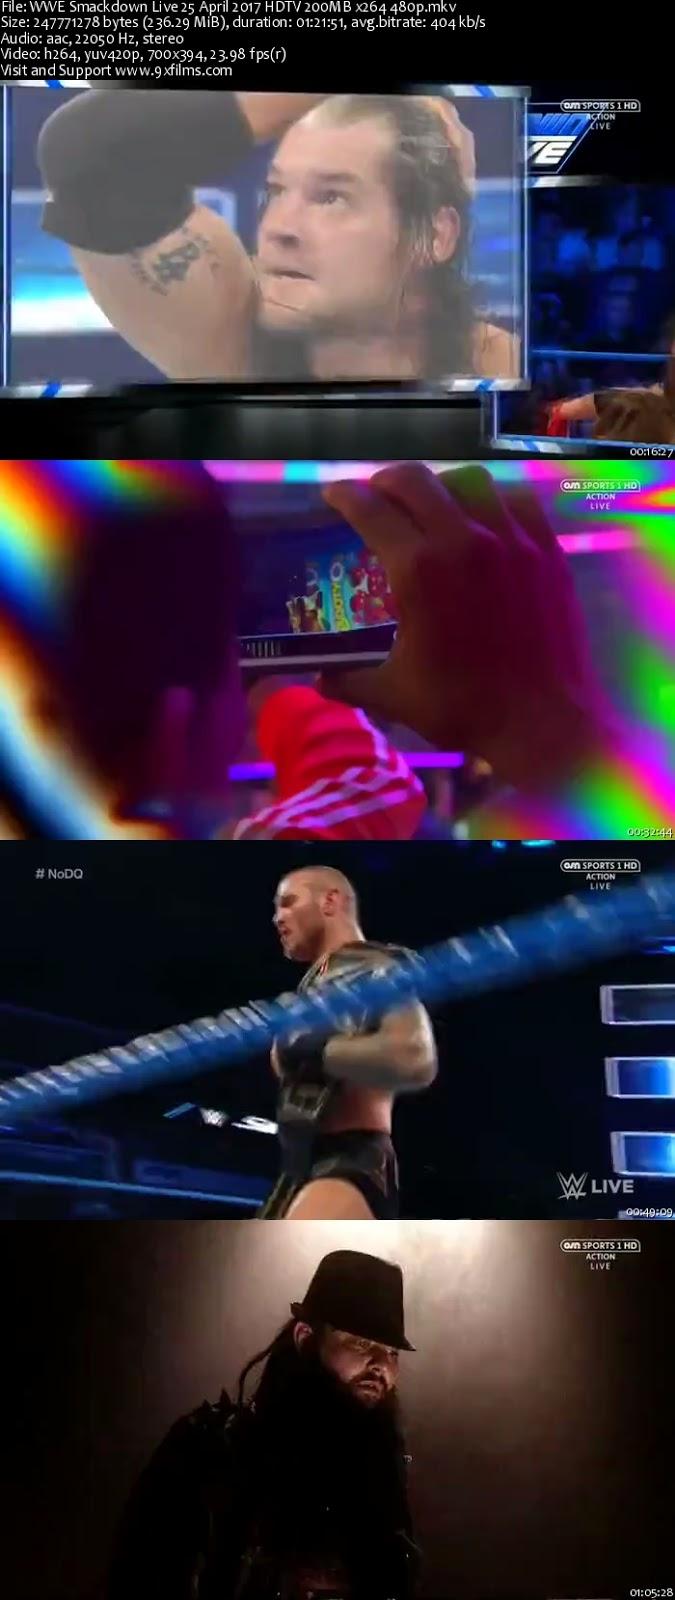 WWE Smackdown Live 25 April 2017 HDTV 480p